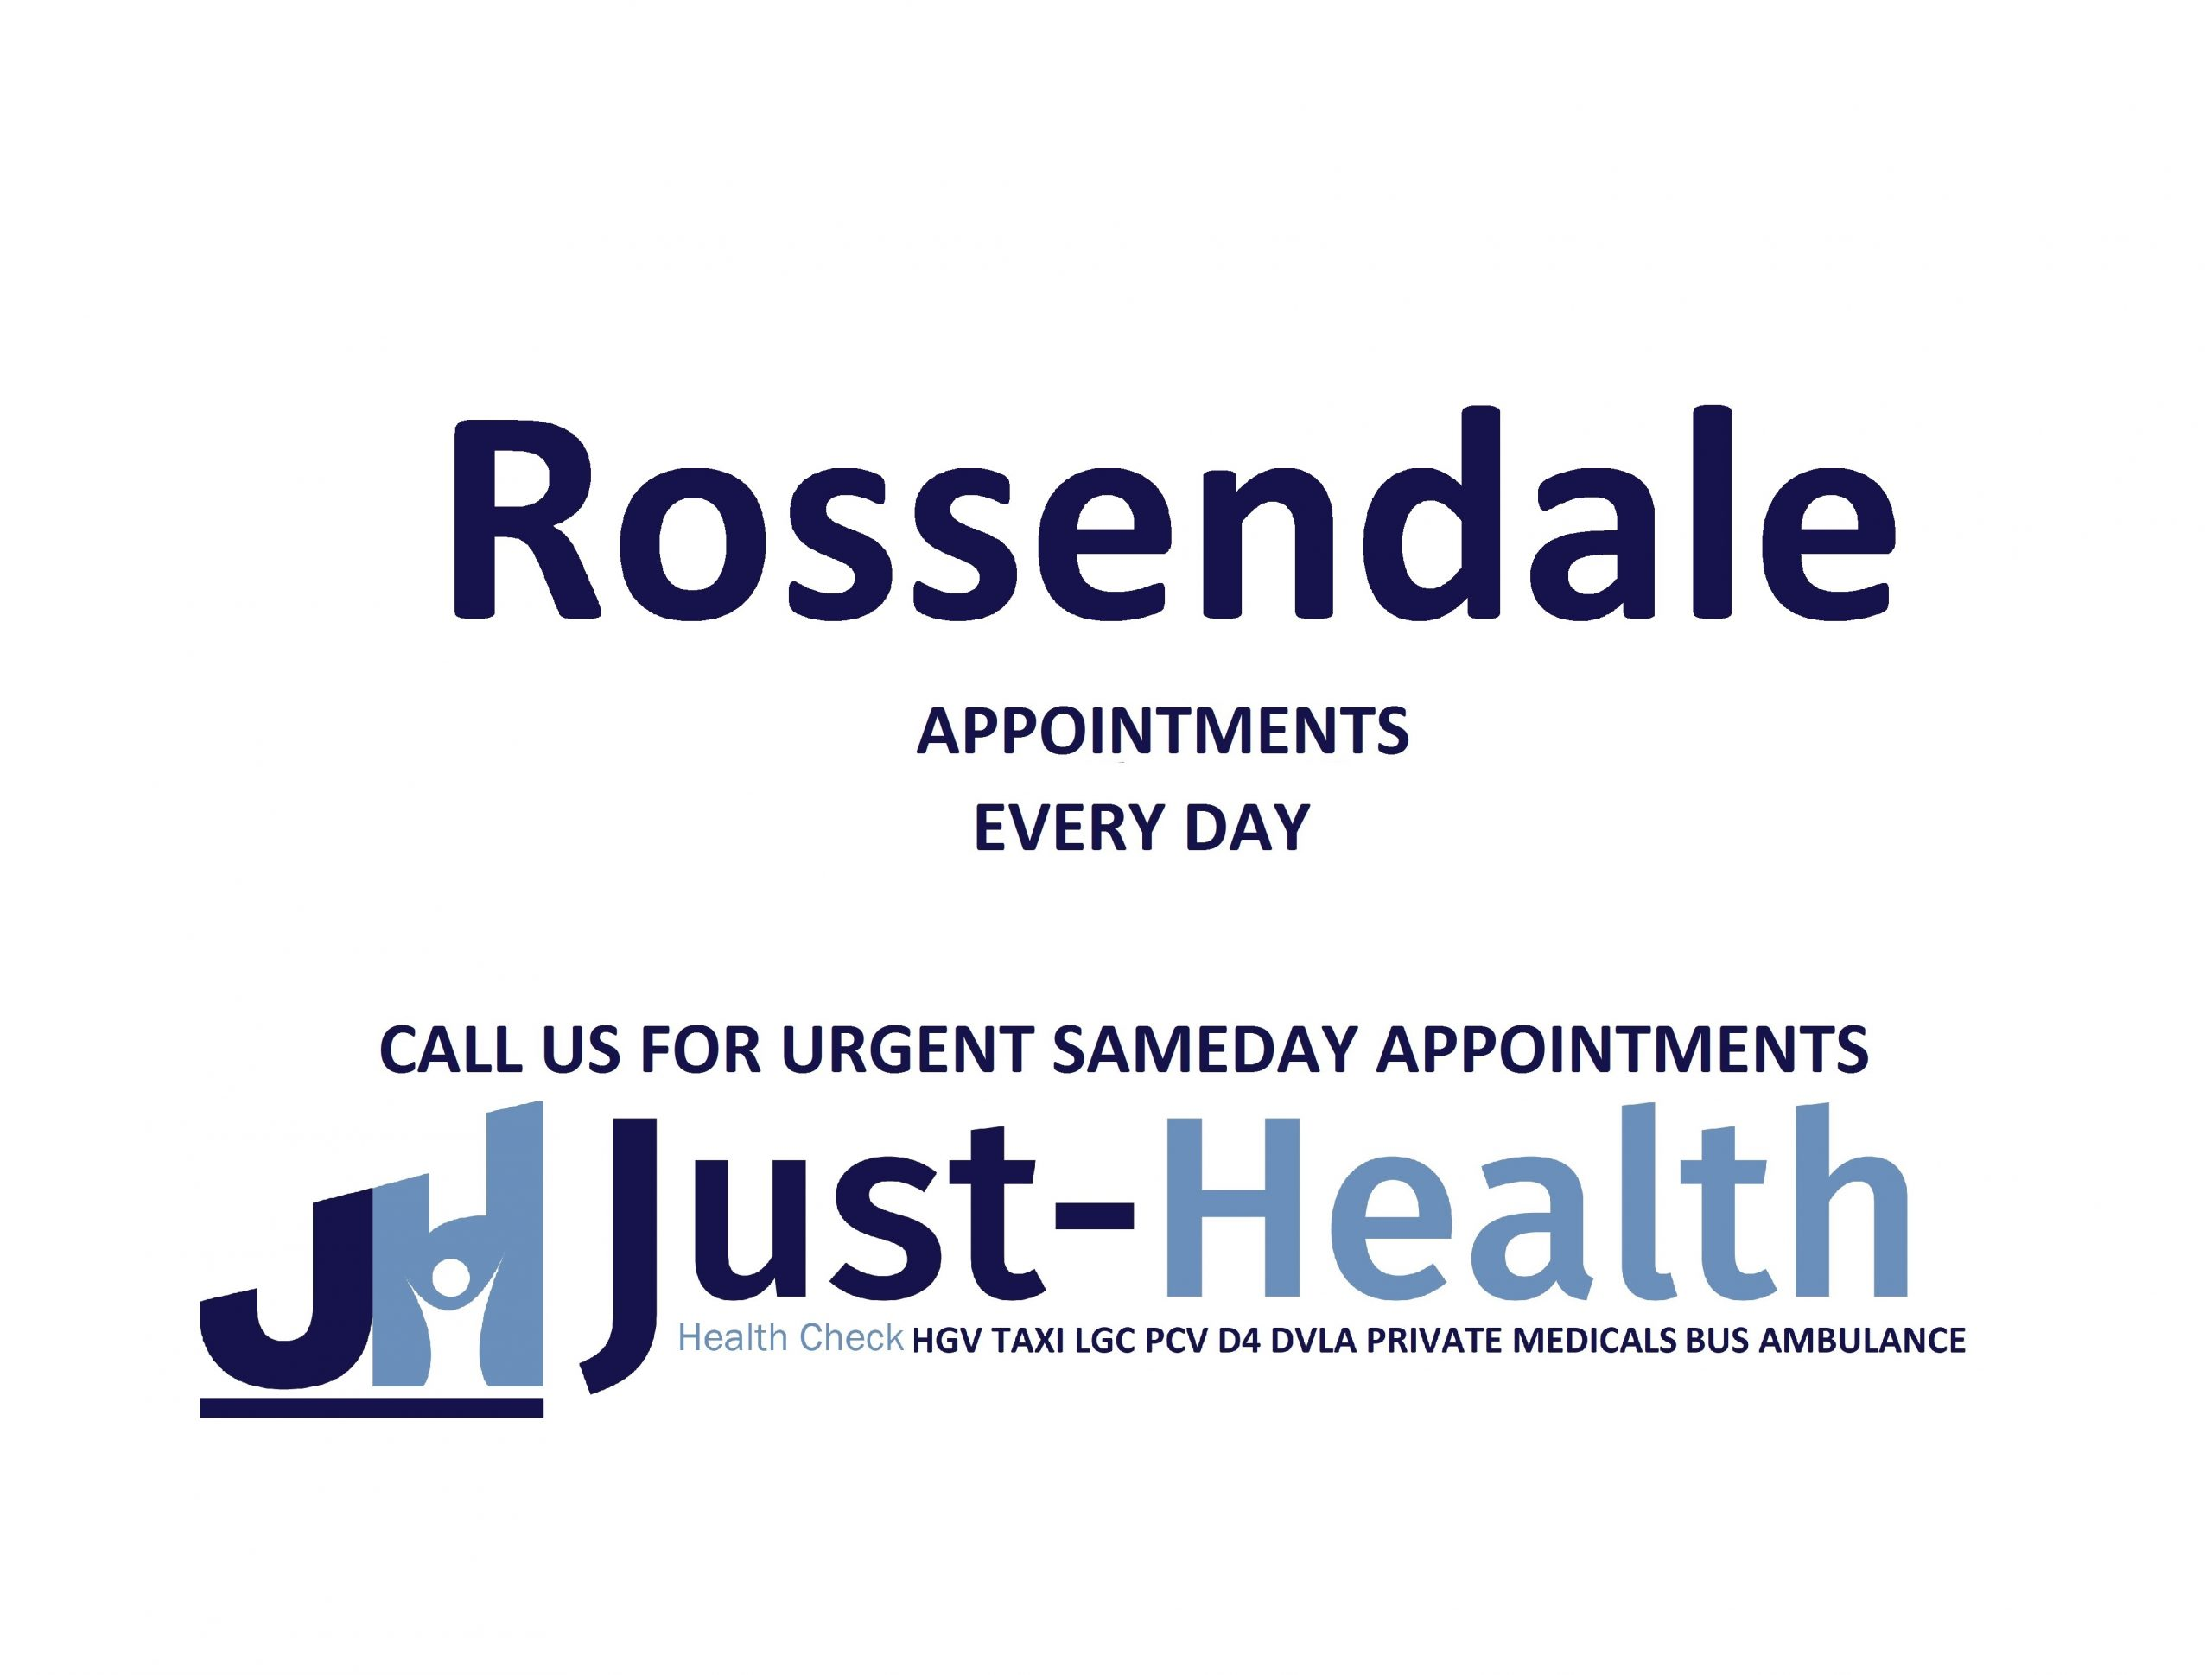 d4 PSV LGV Taxi Pcv HGV medical just health clinic rossendale lancashire burnley haslingden